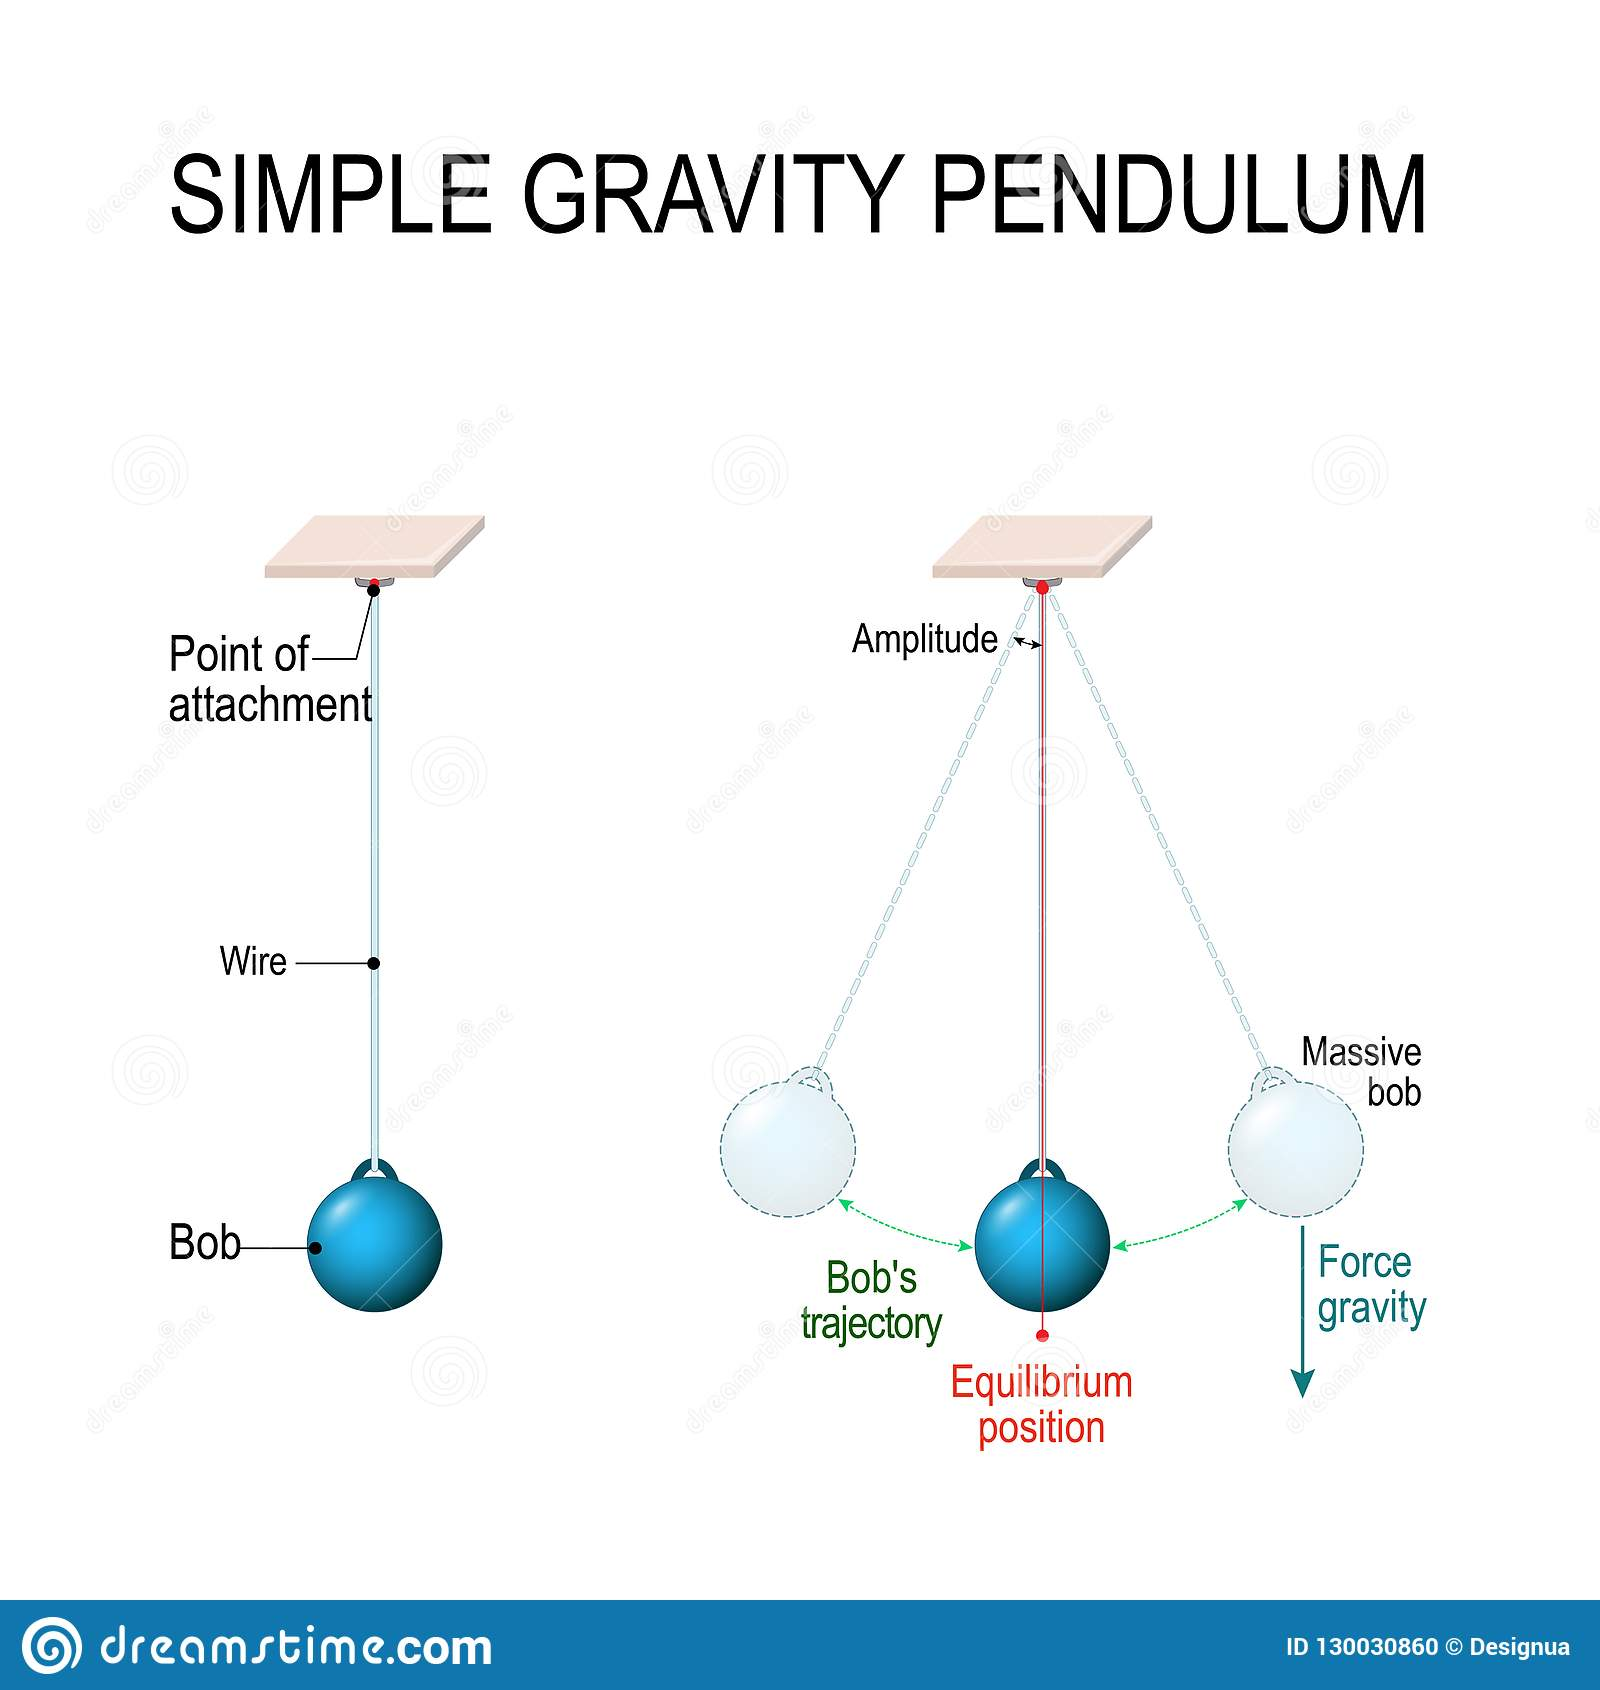 Simple gravity pendulum